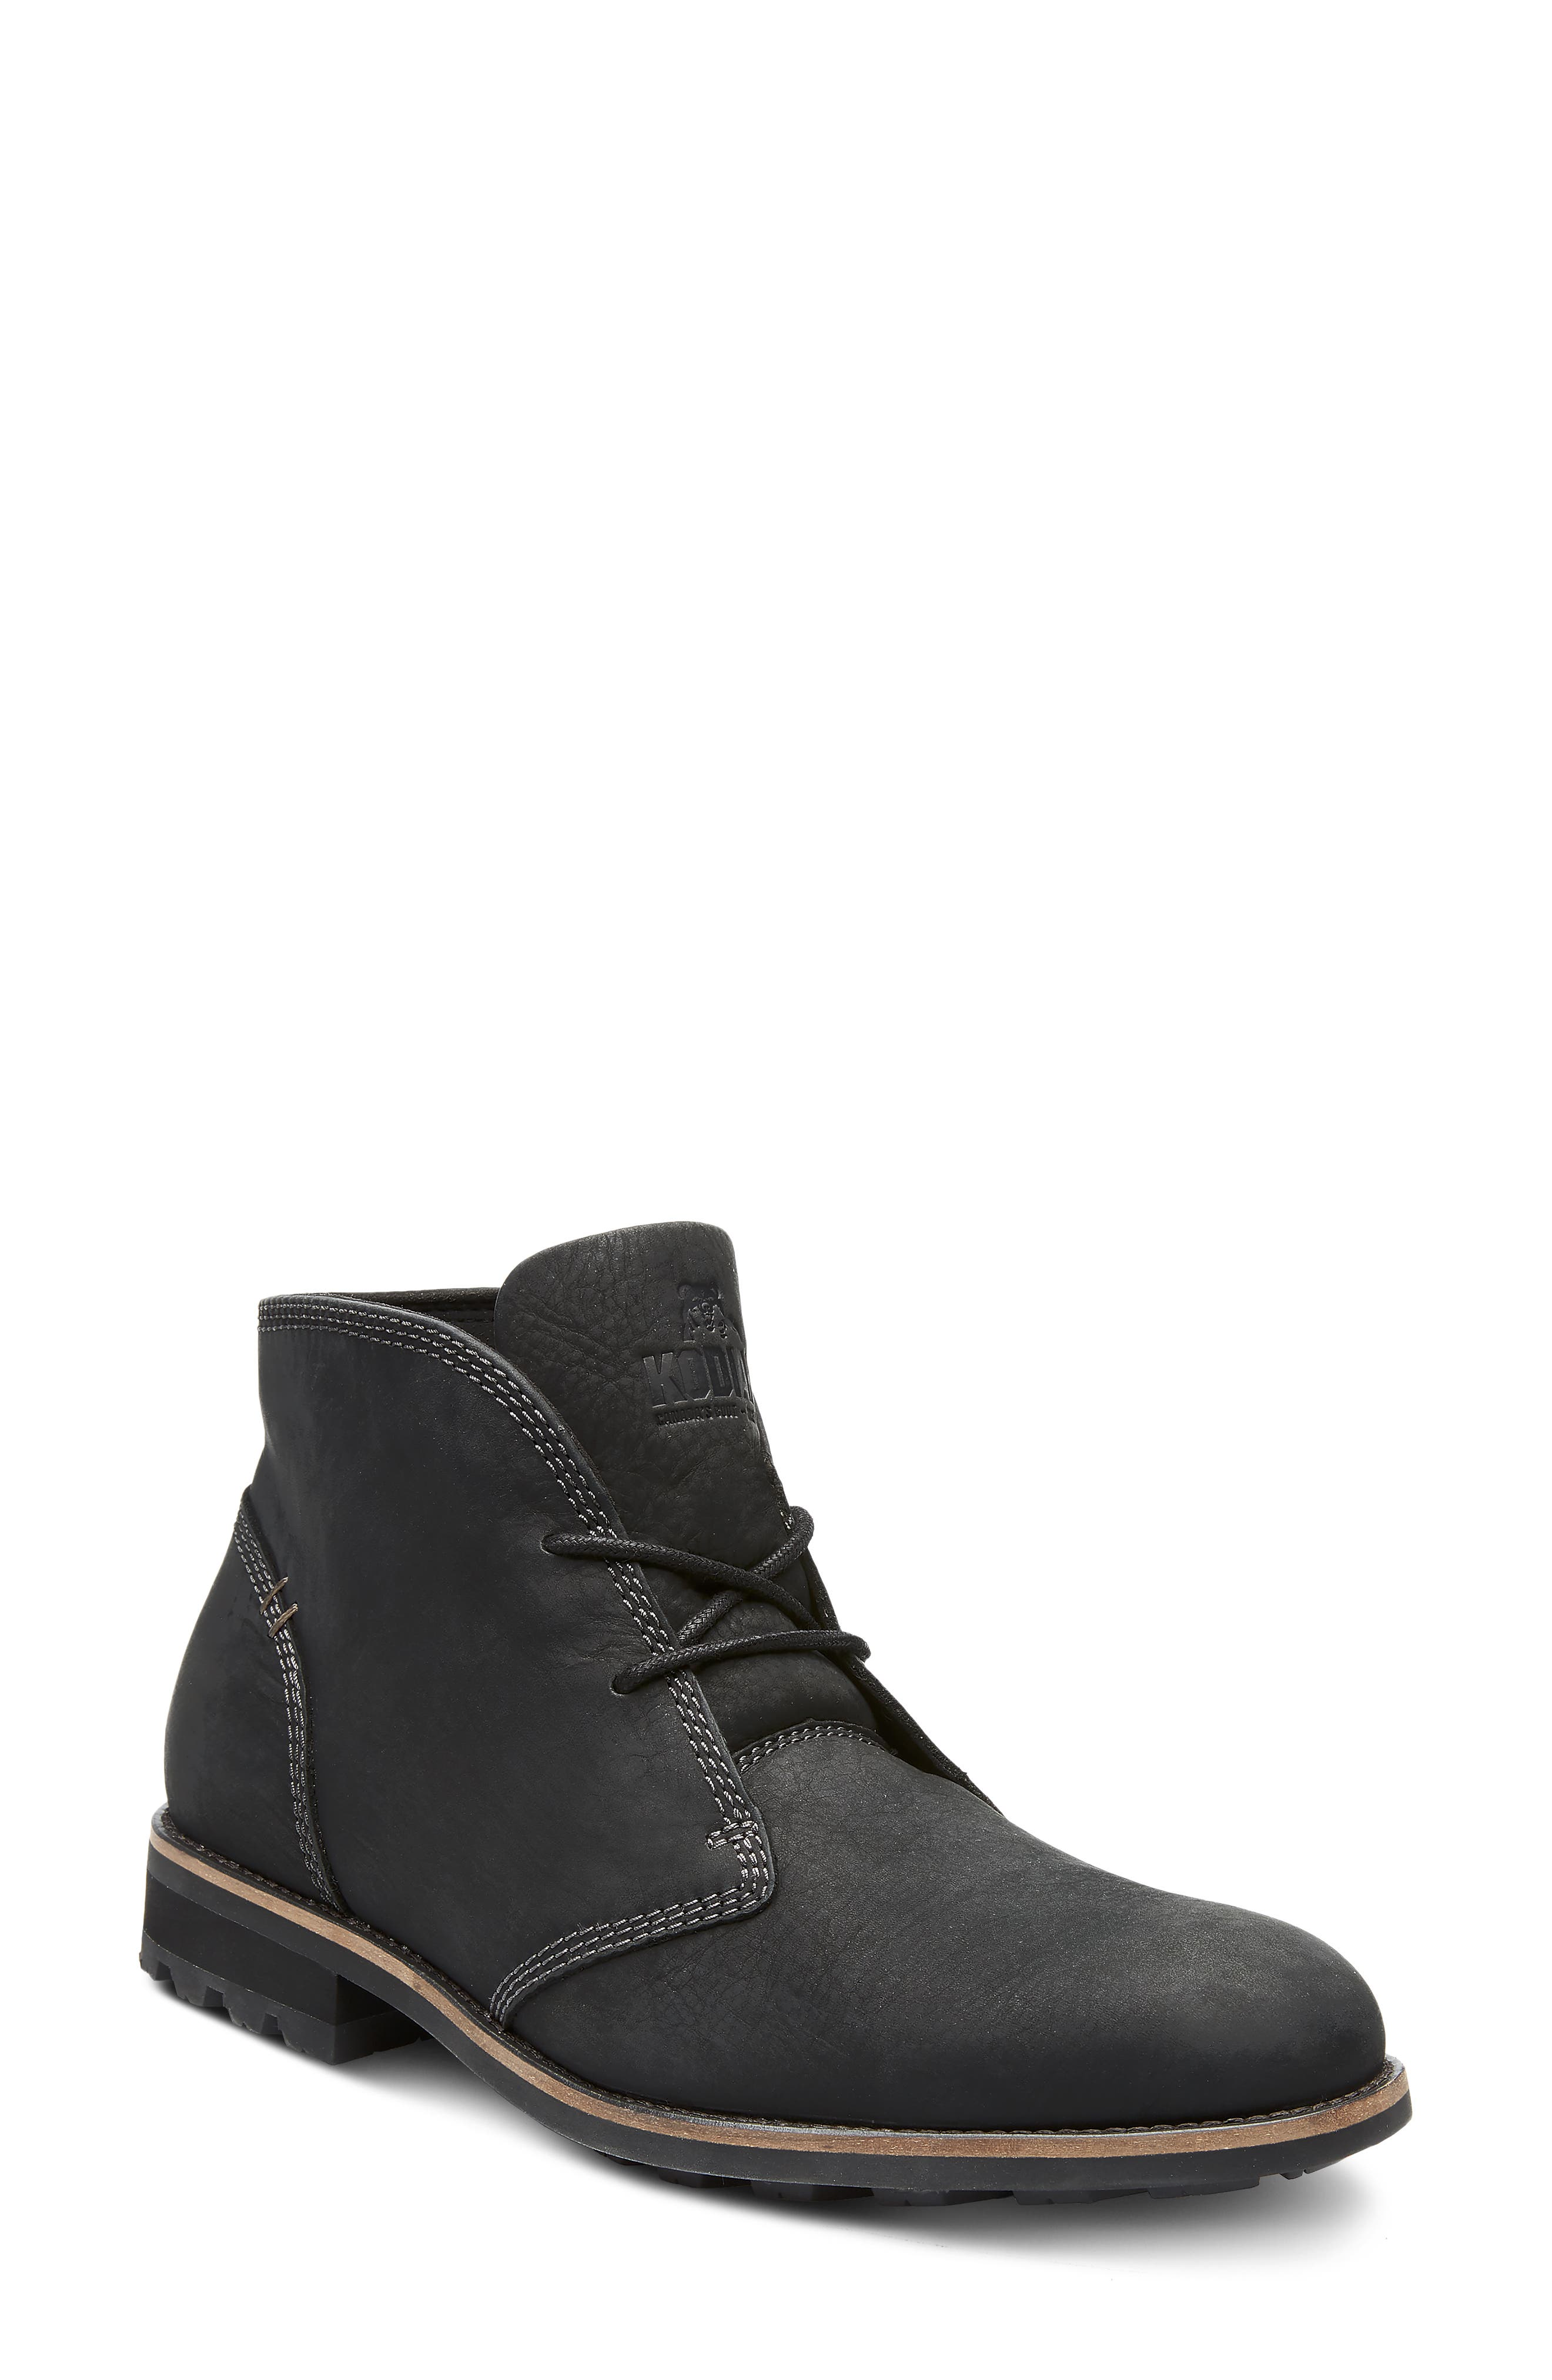 Mckernan Waterproof Chukka Boot